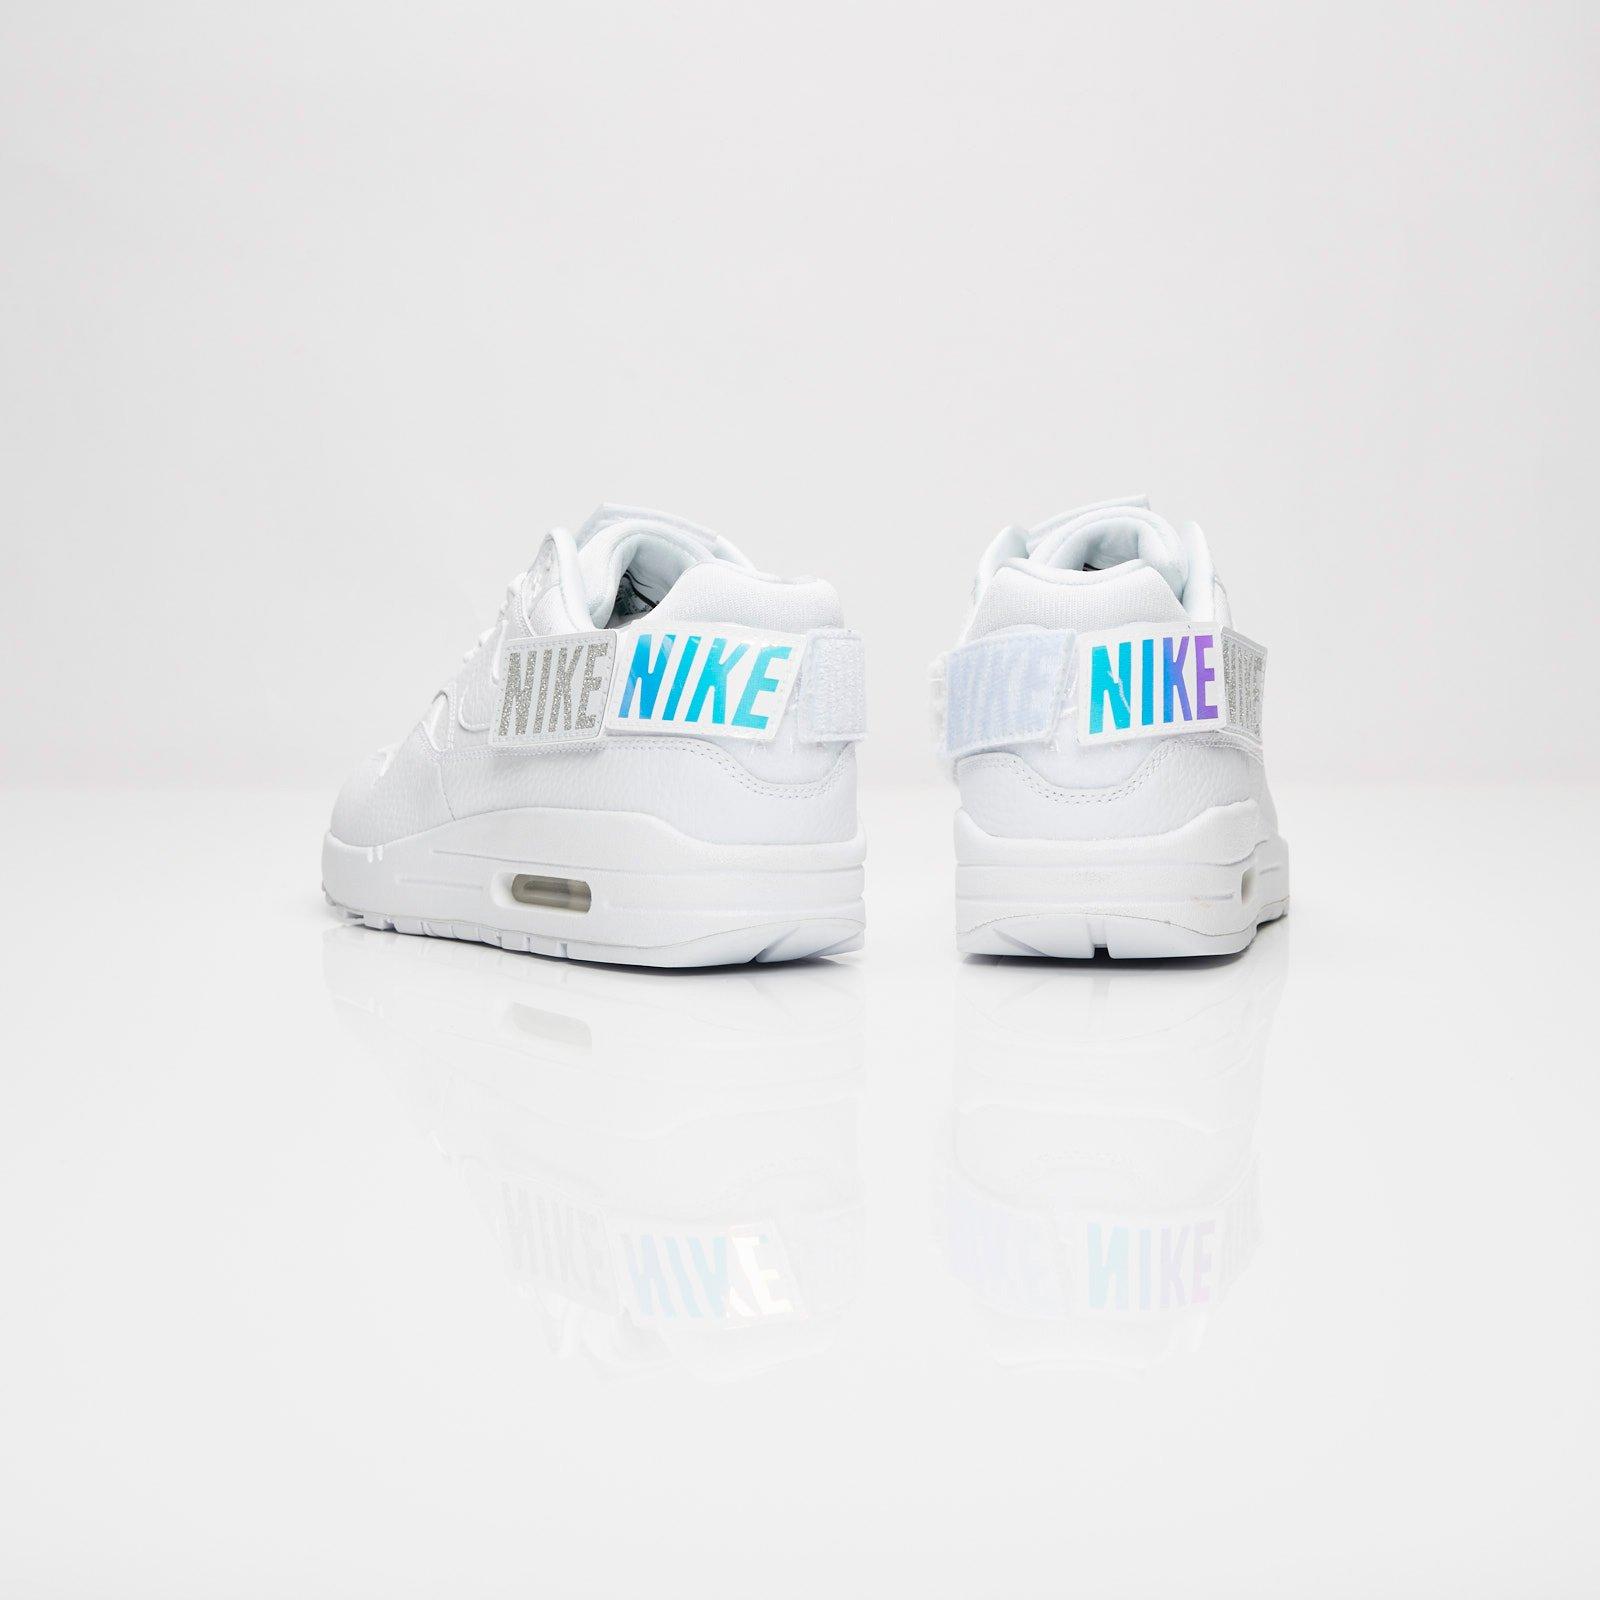 94b182718a4a1 Nike W Air Max 1-100 - Aq7826-100 - Sneakersnstuff | sneakers & streetwear  online since 1999